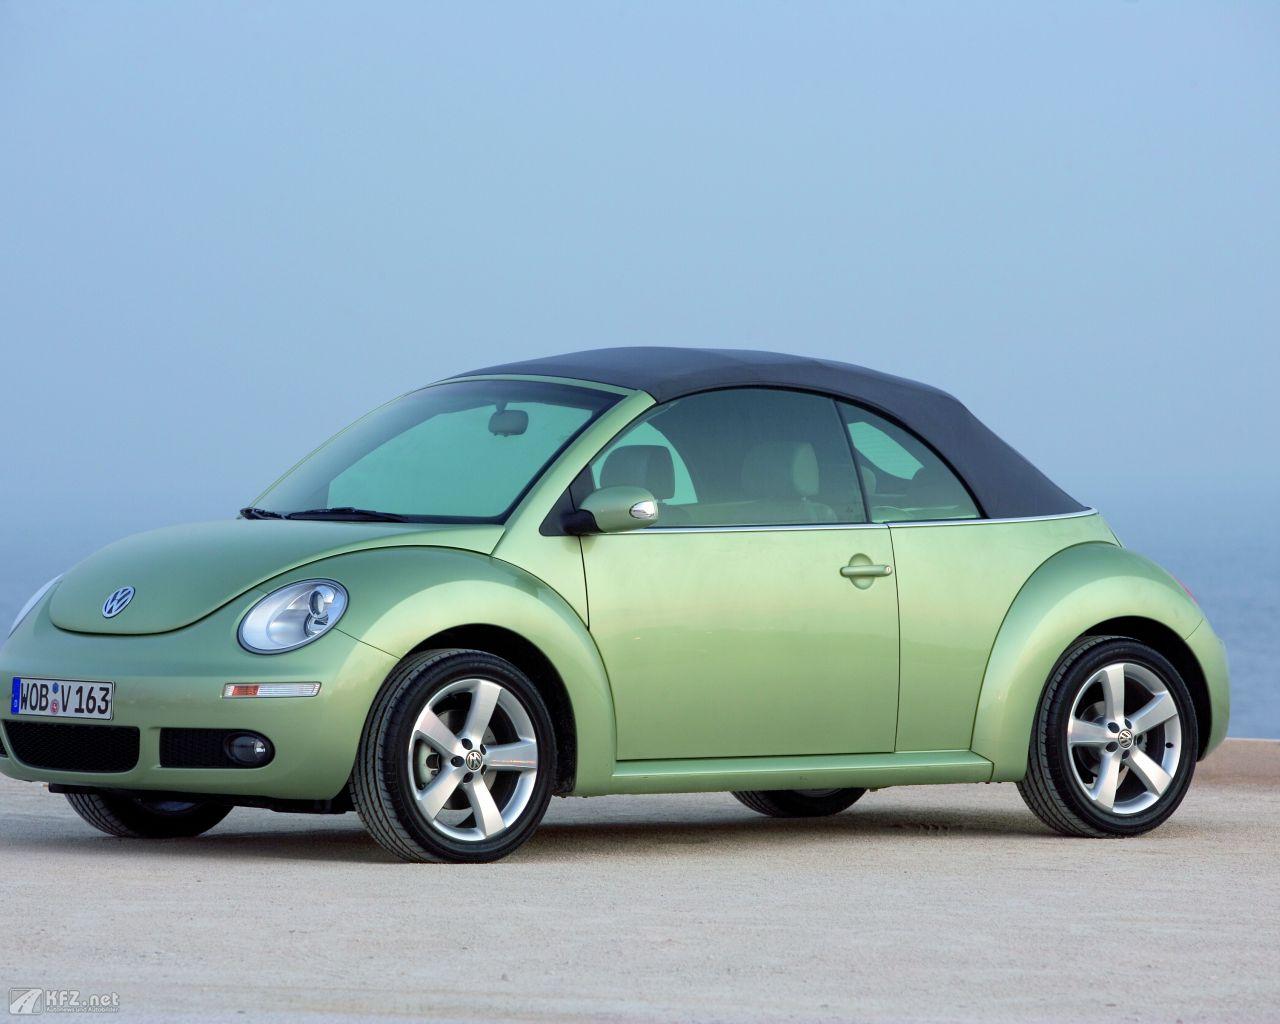 vw-beetle-1280x1024-15